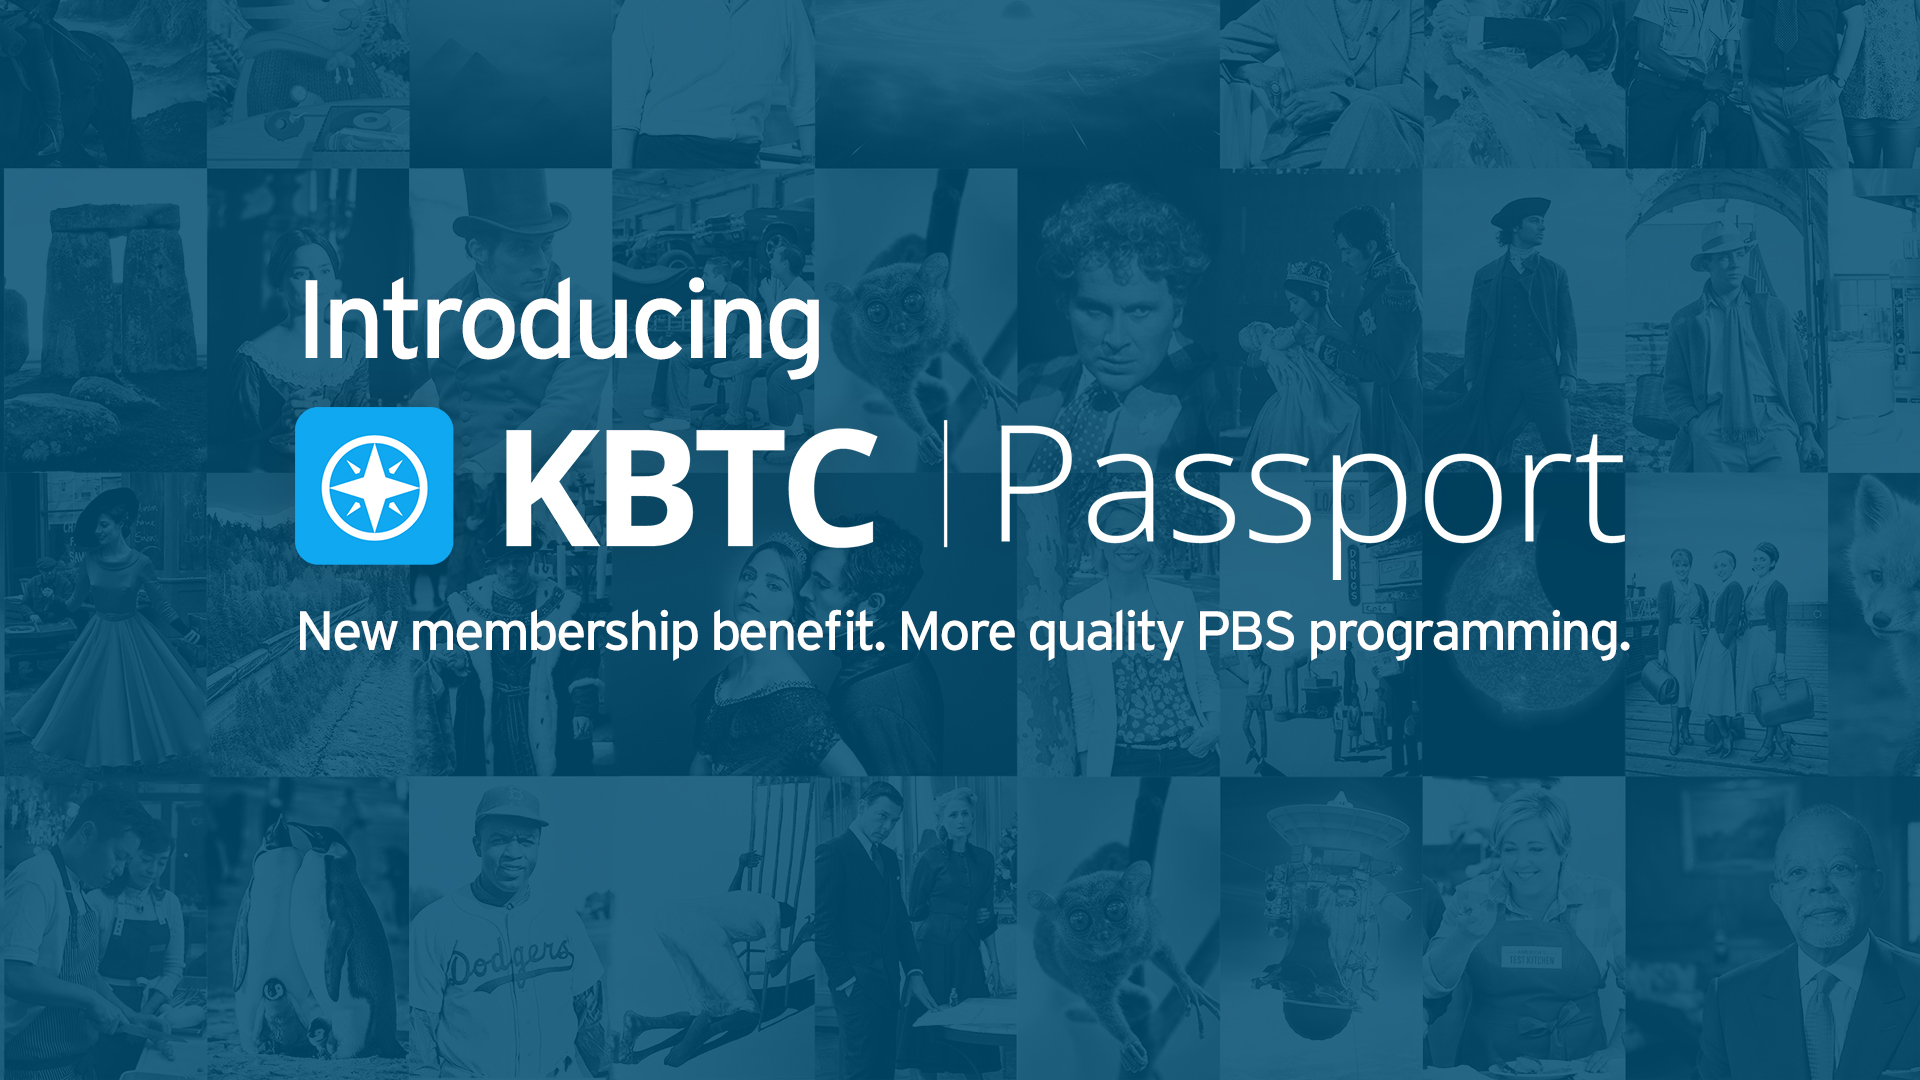 KBTC Passport